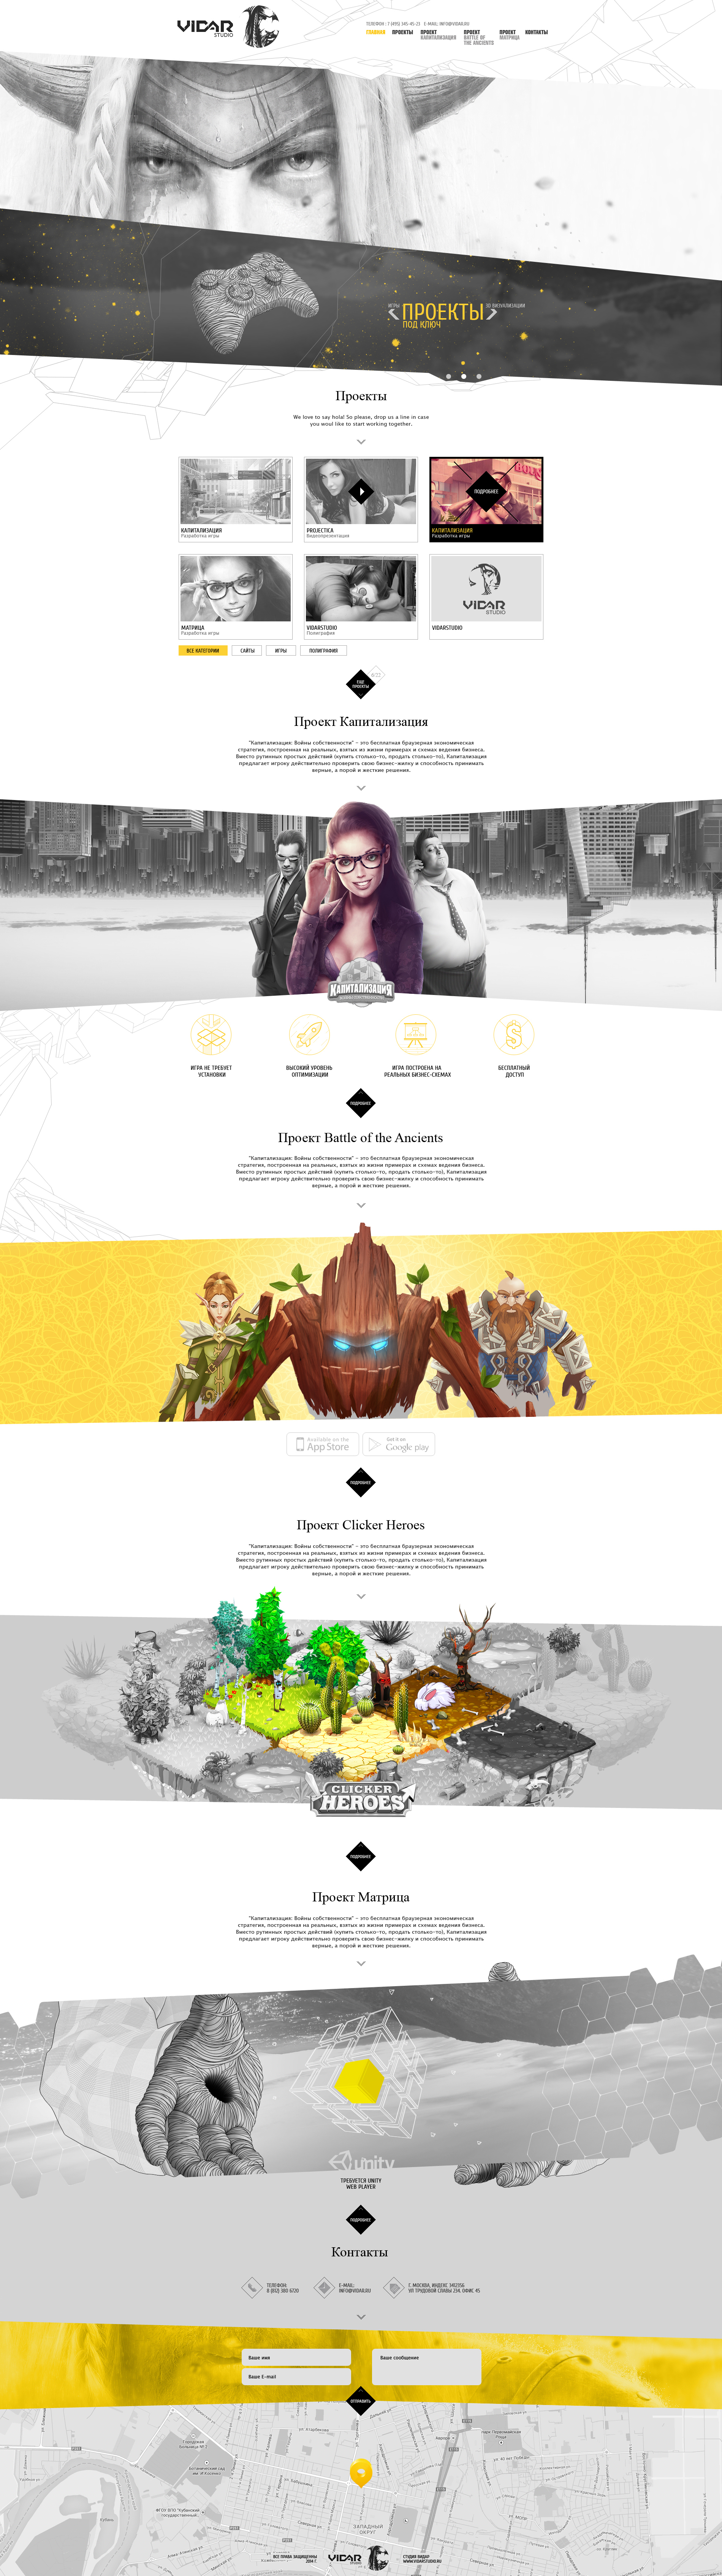 Vidar Studio Landing page design